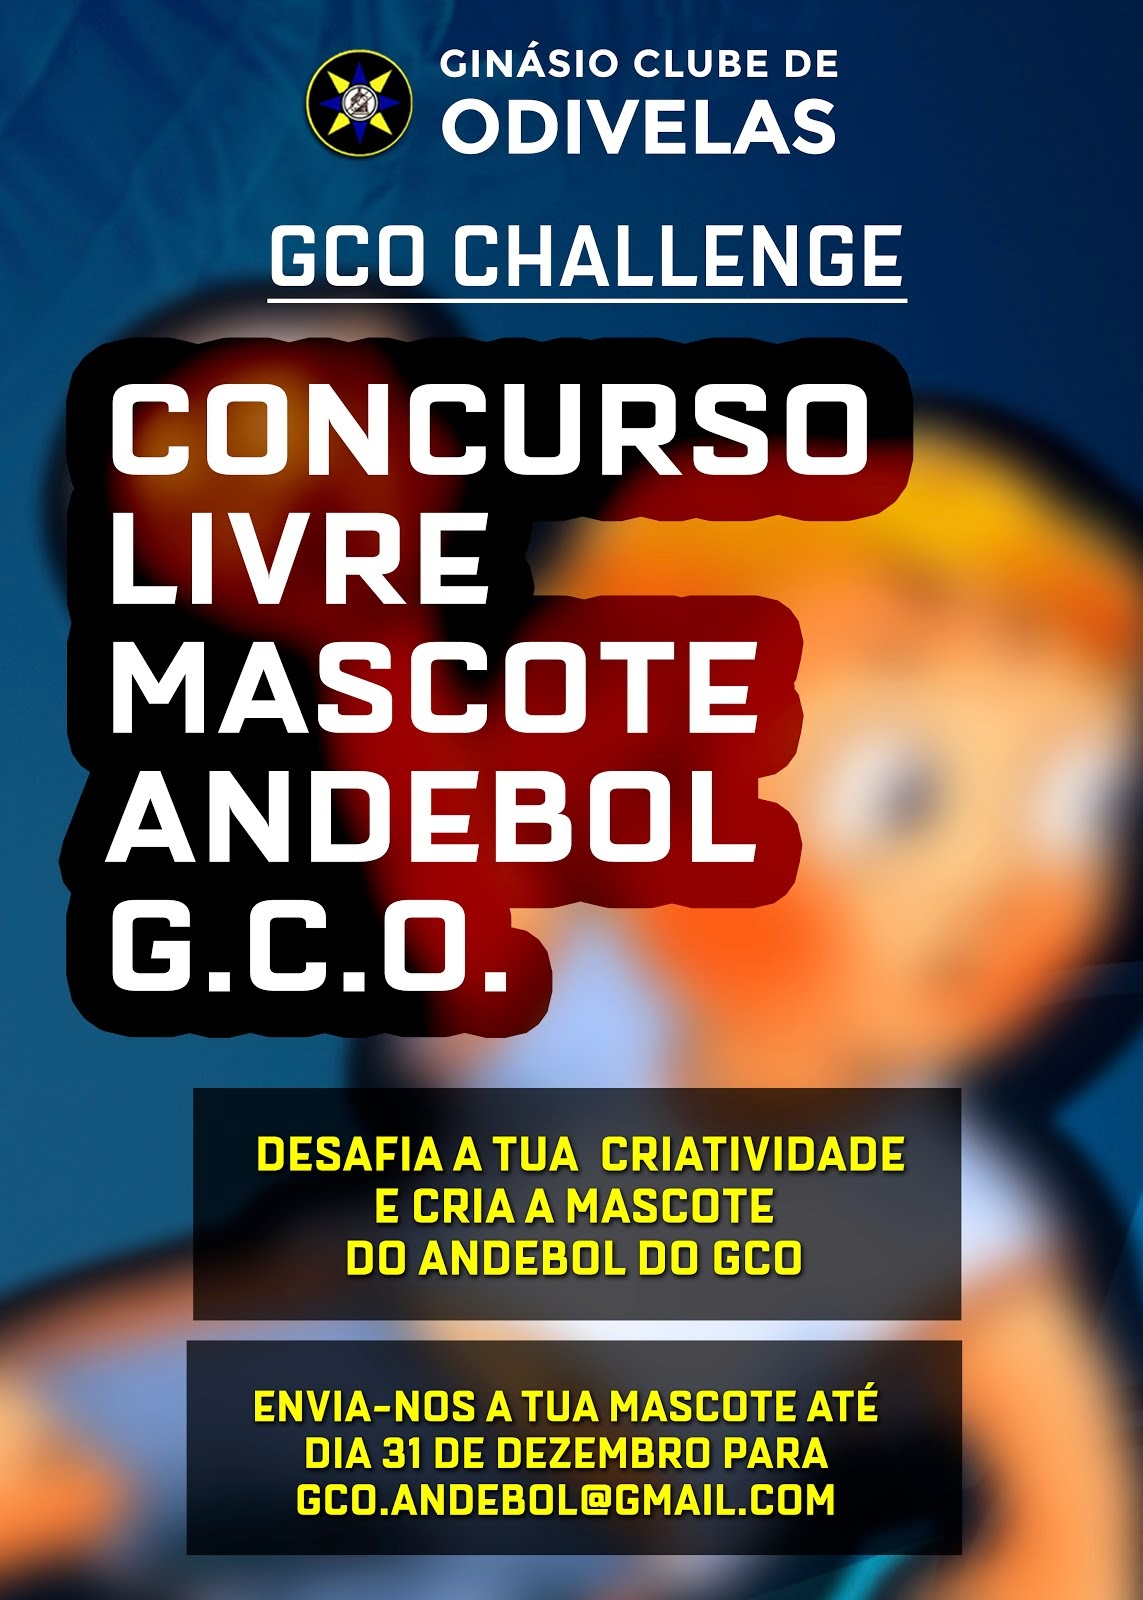 ANDEBOL GCO CHALLENGE - DESAFIA A TUA CRIATIVIDADE